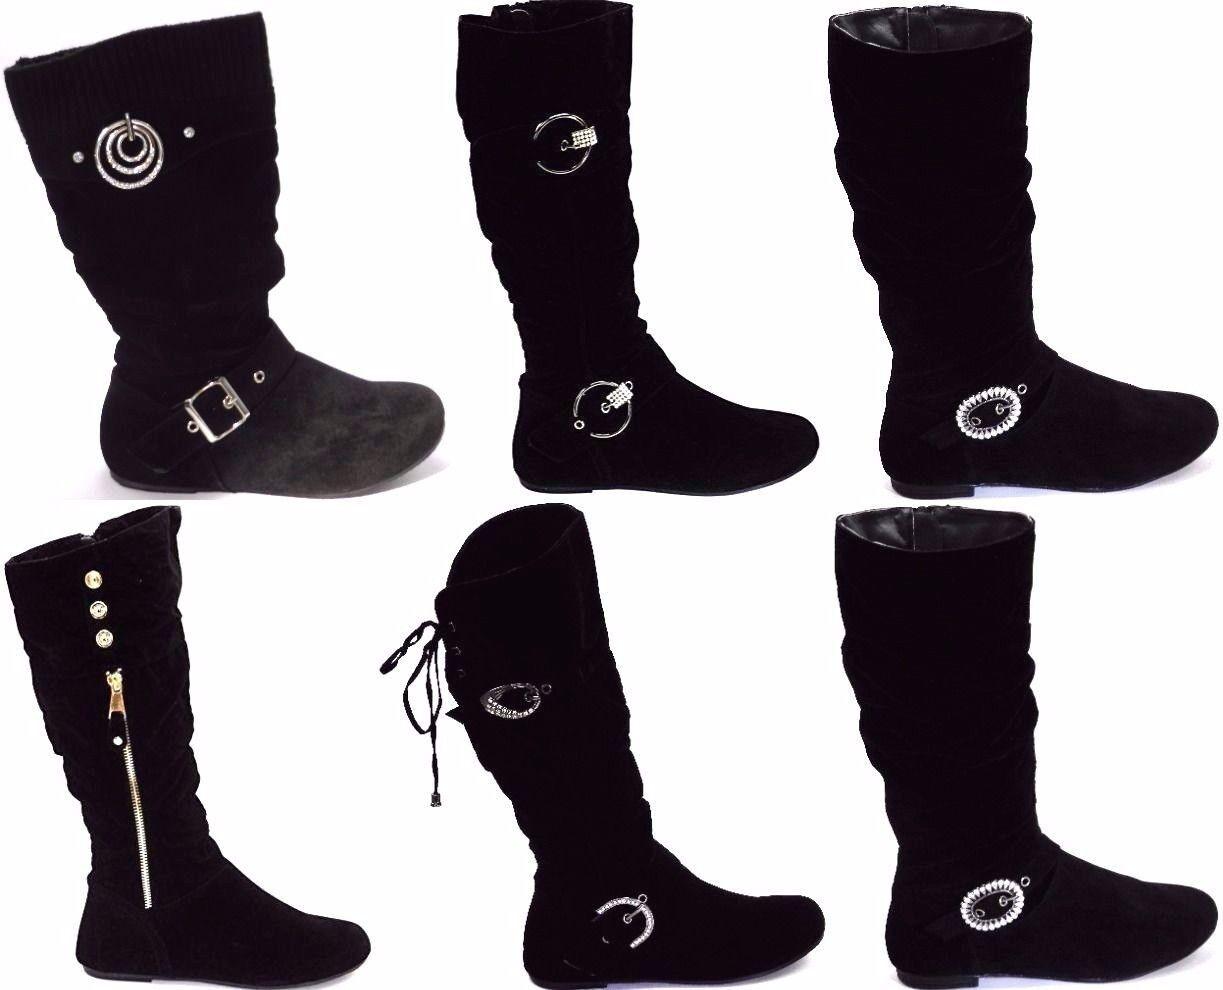 Women's Knee High Mid calf Slouchy Rhinestone Buckle Riding Boot Shoe Sz 6-10